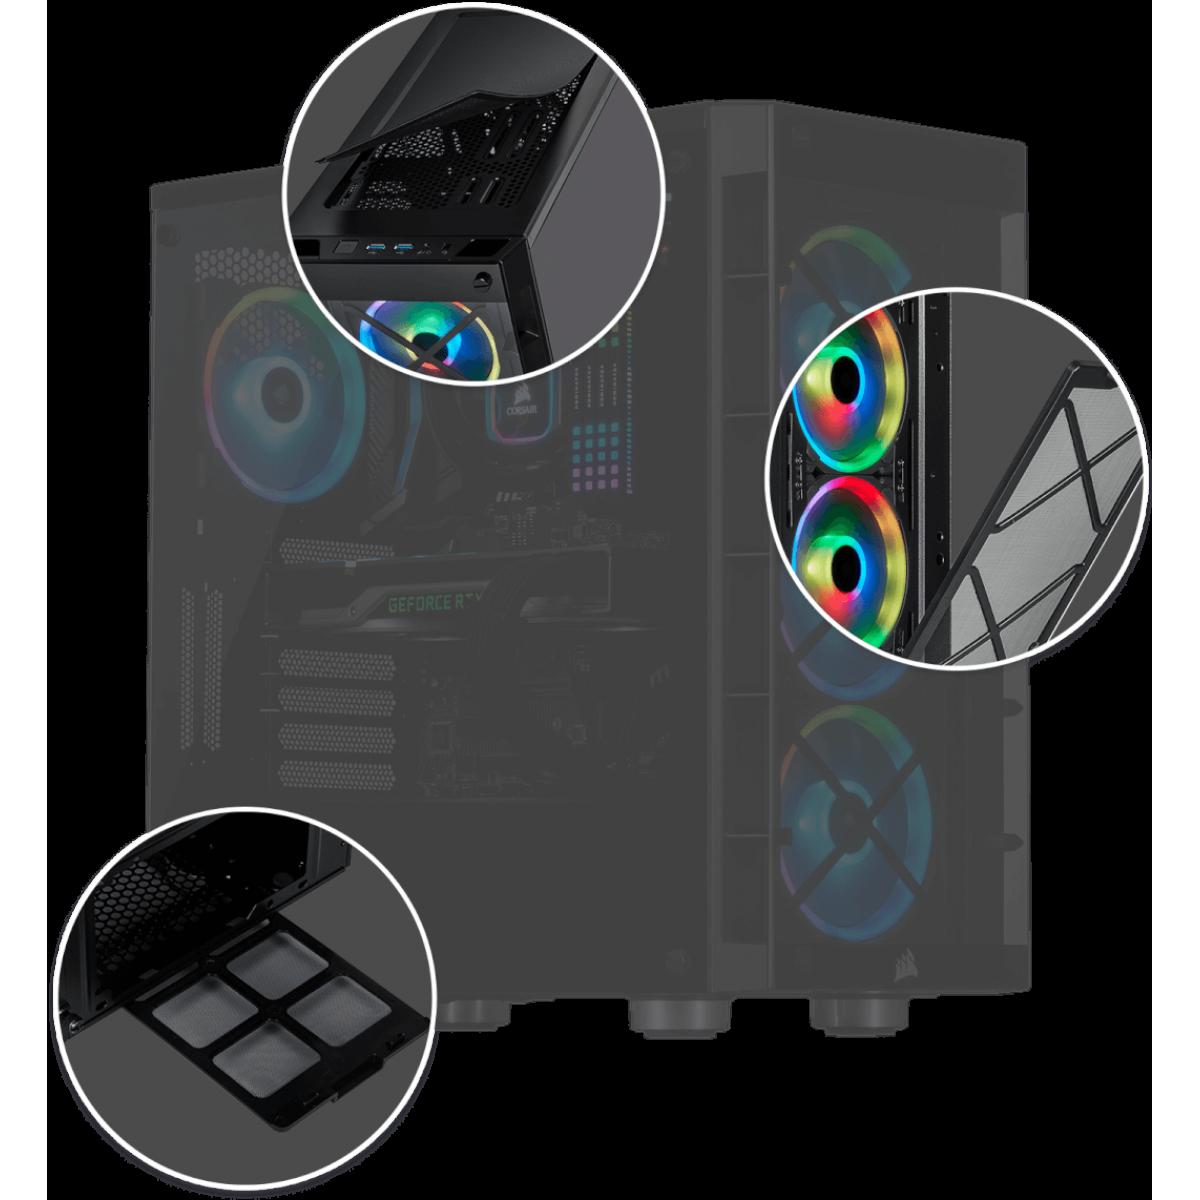 Gabinete Gamer Corsair iCue 465X, Mid Tower, Com 3 Fans, Vidro Temperado, Black, Sem Fonte, CC-9011188-WW